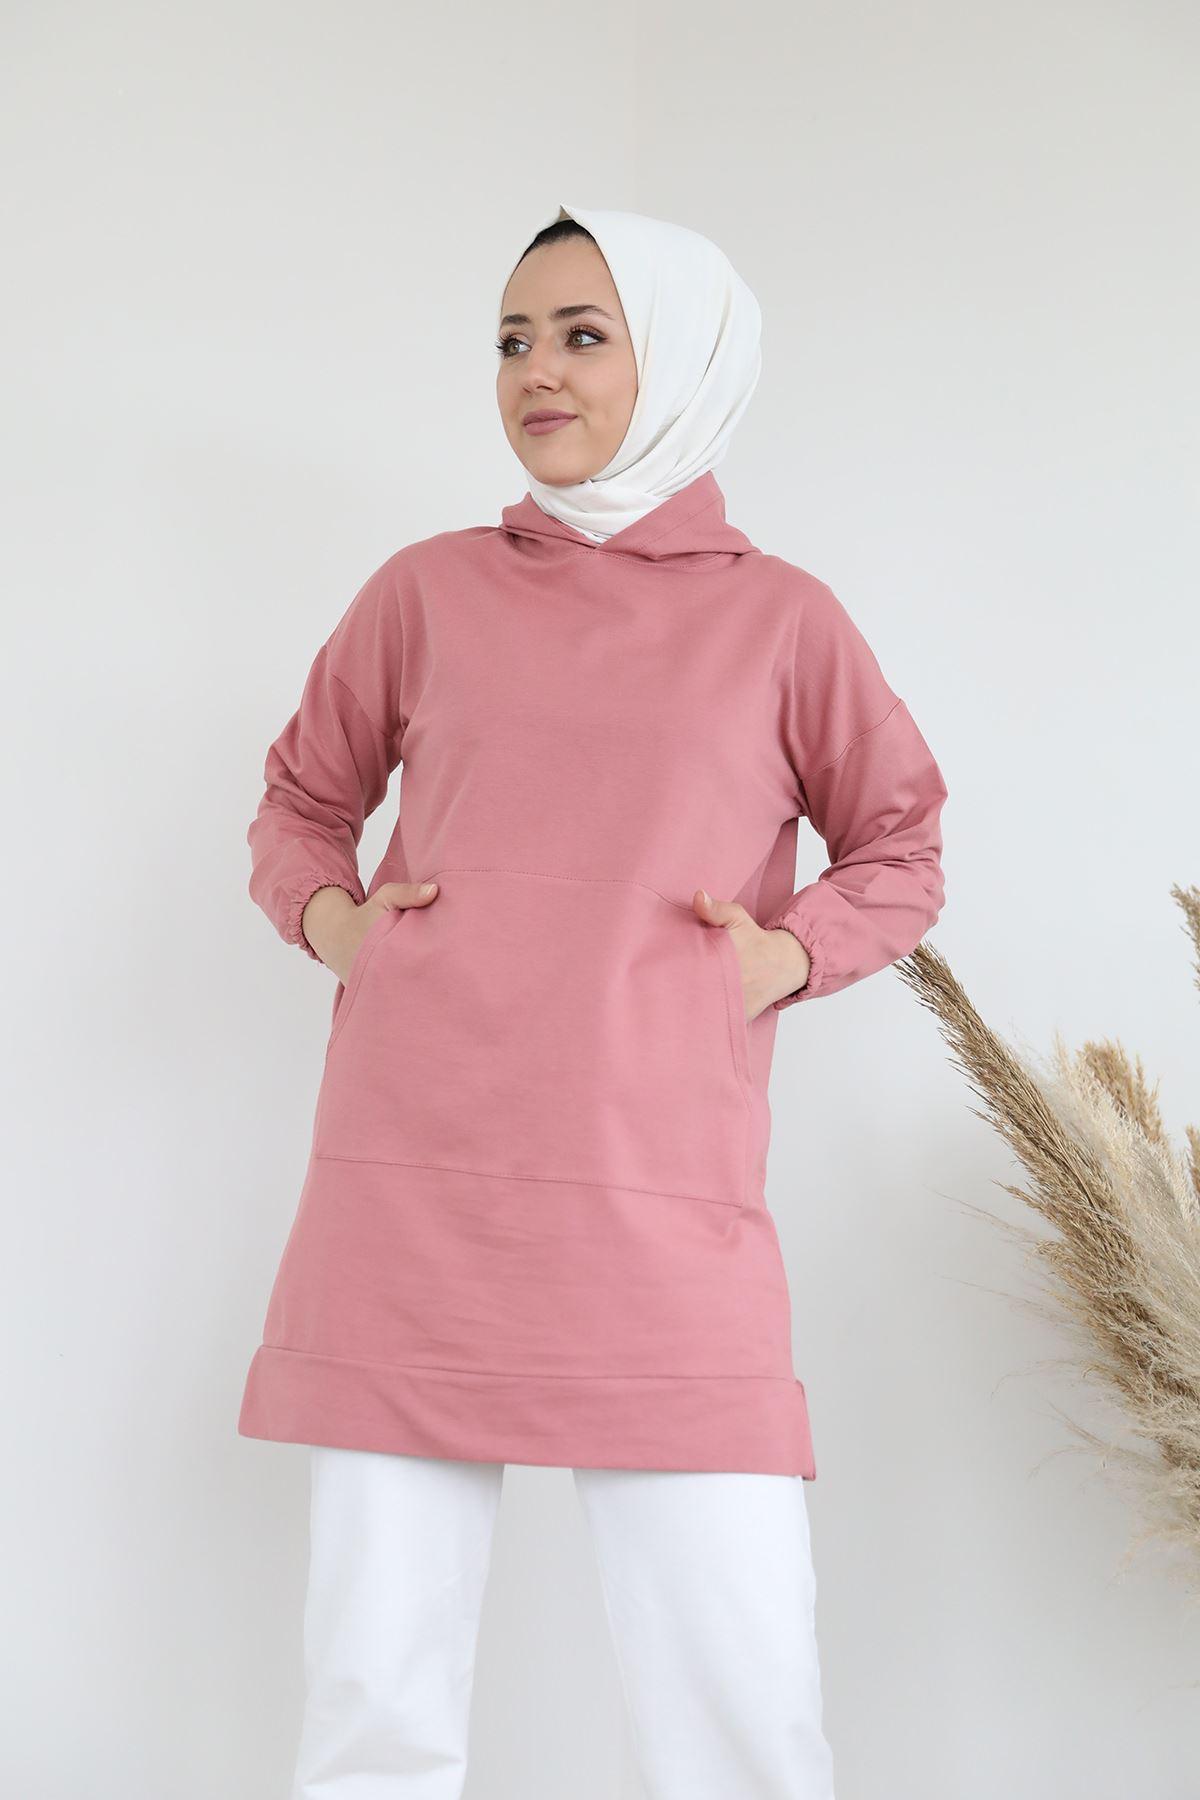 Cep Detay Kapşonlu Sweatshirt-Gül Kurusu